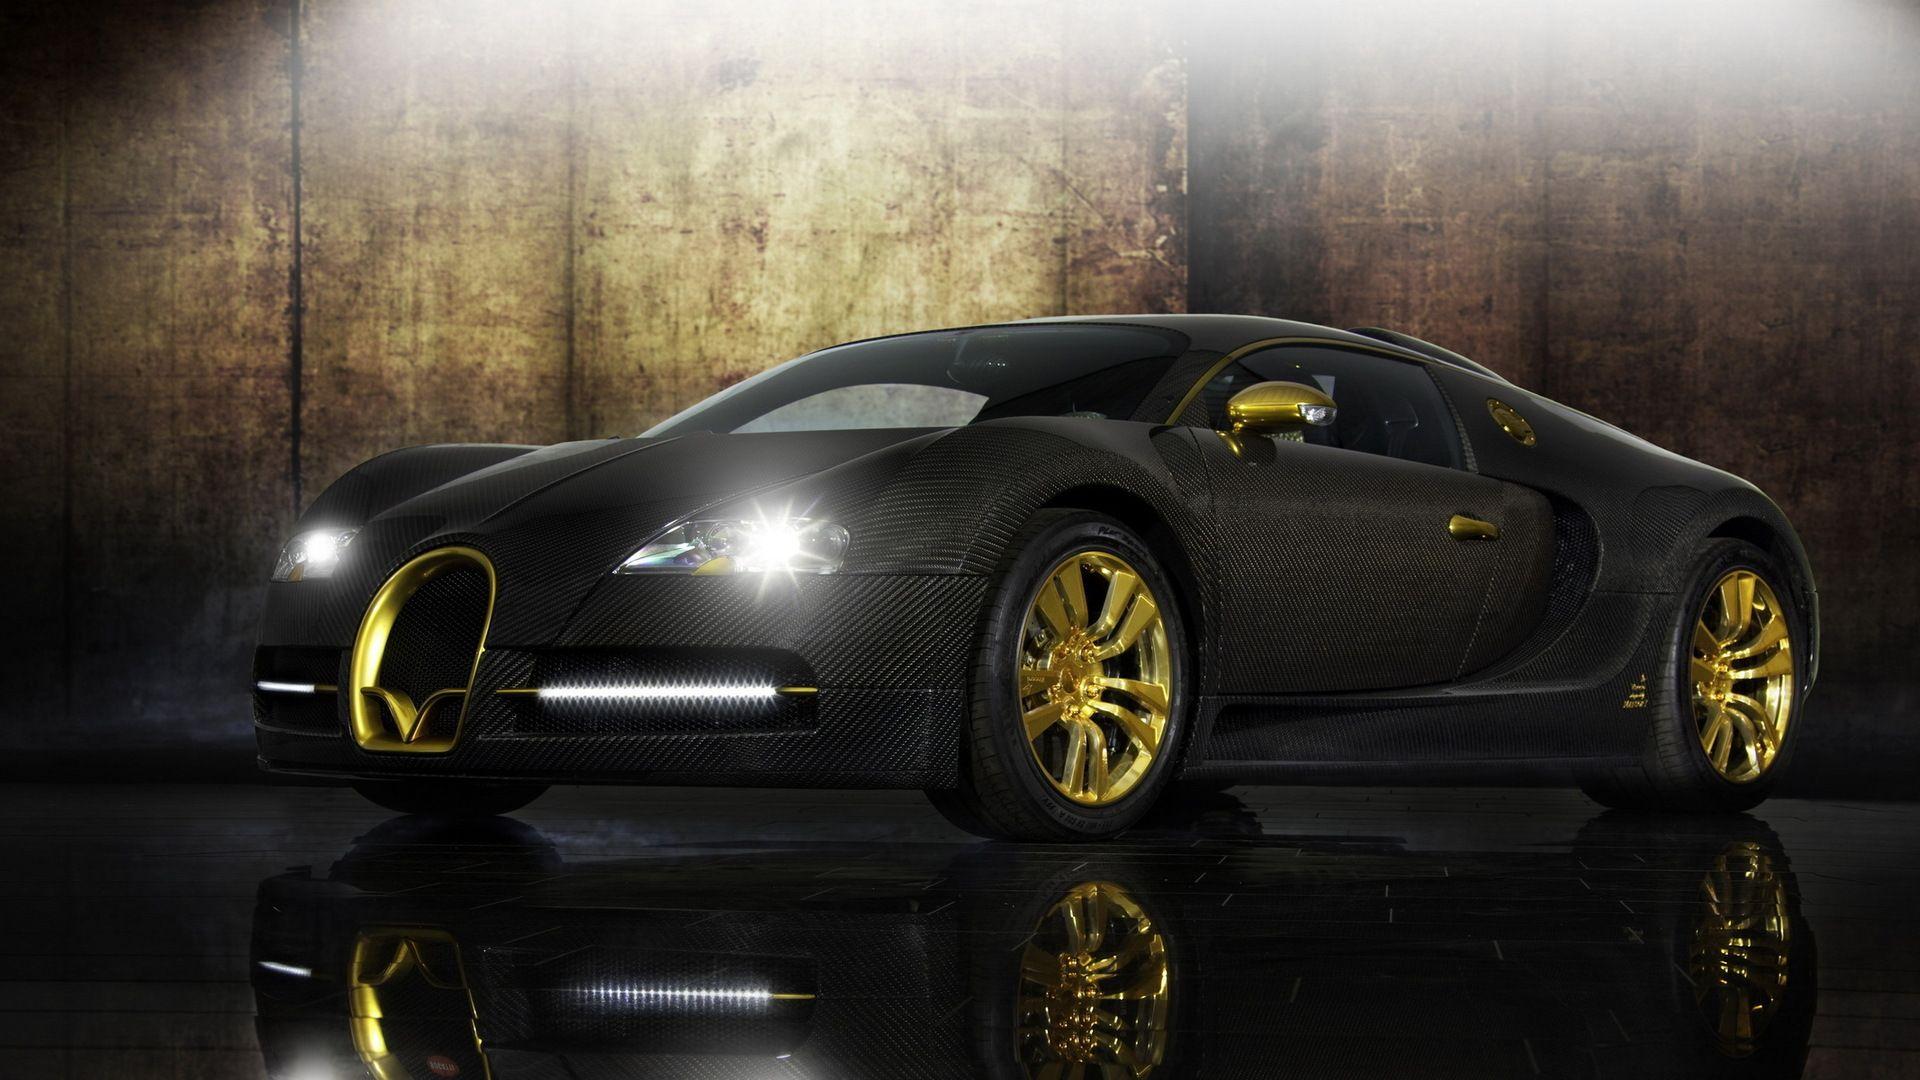 1000 images about bugatti veyron wallpaper on pinterest super sport cars and v12 engine - Bugatti Veyron Wallpaper